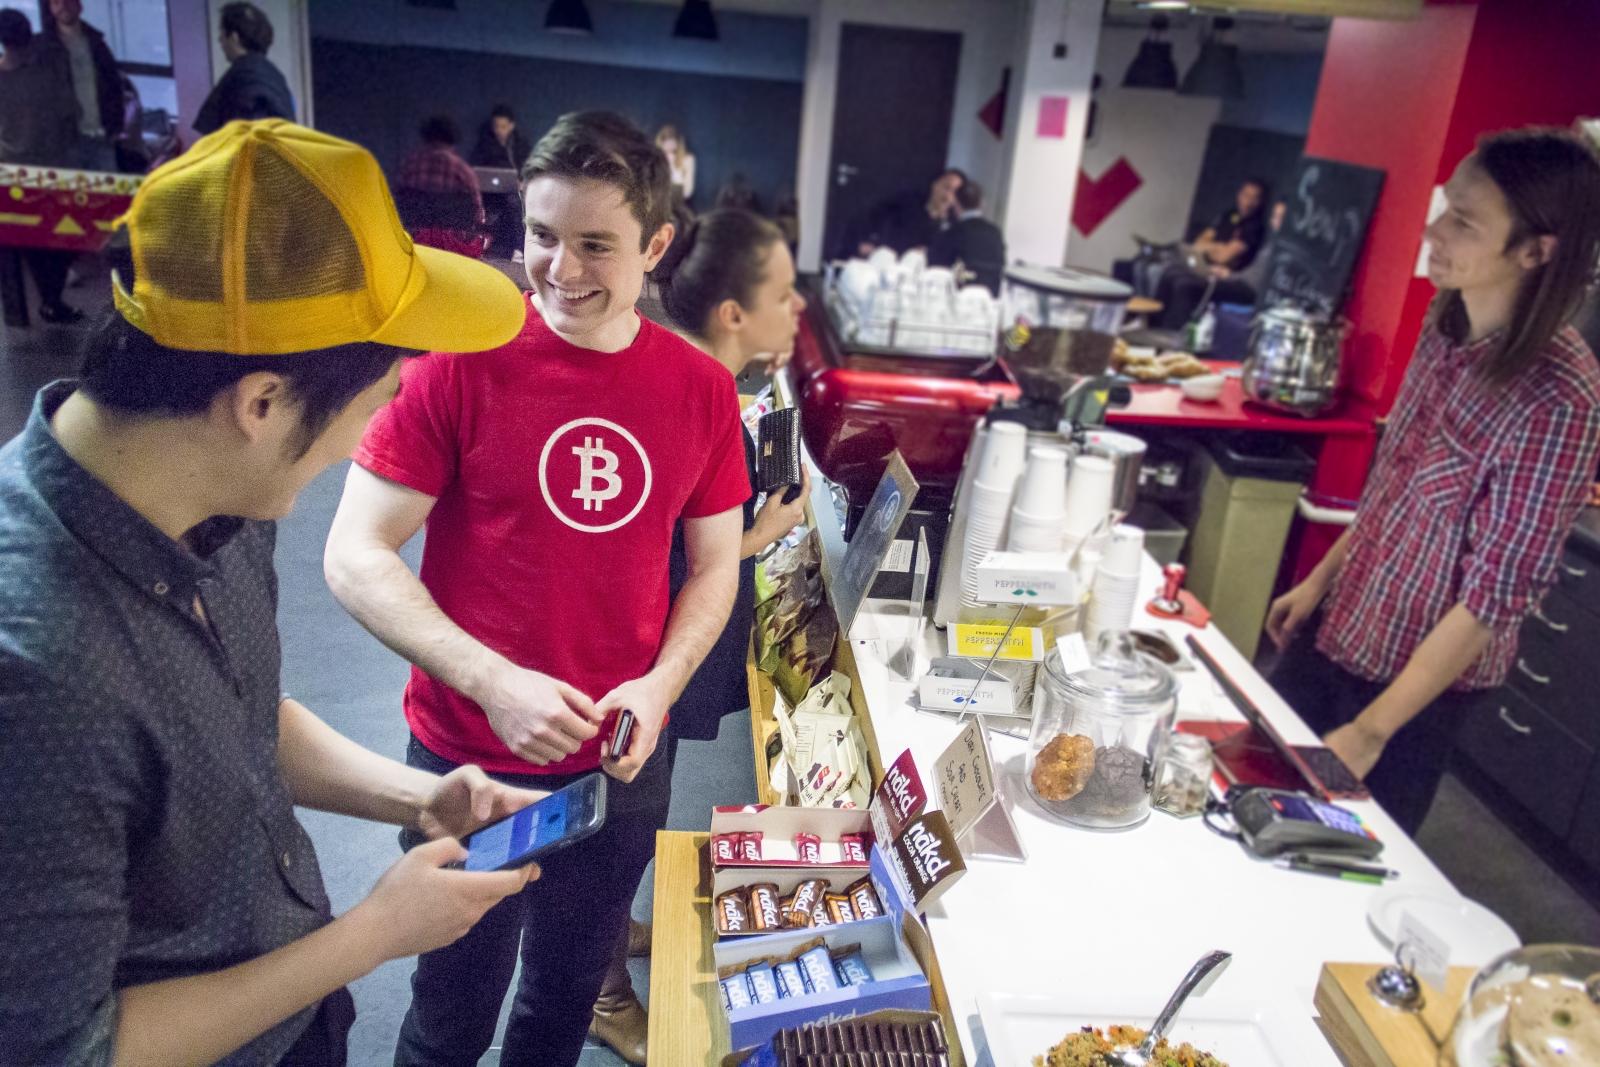 living on bitcoin london